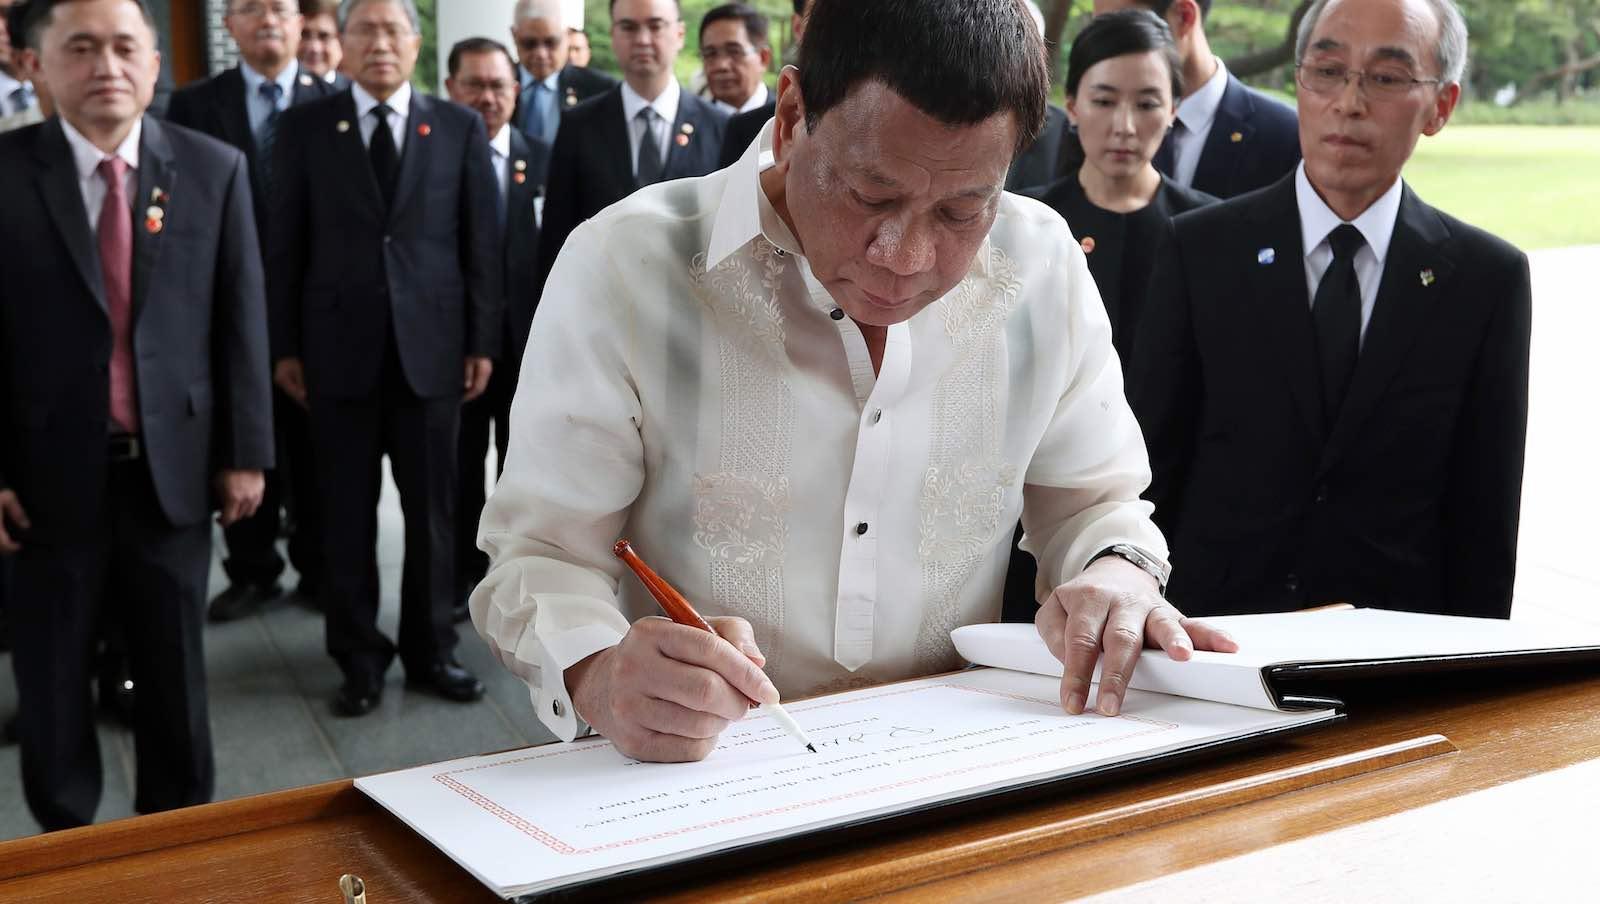 Philippines President Rodrigo Duterte during a visit this month to South Korea (Photo: KoreaNet/Flickr)